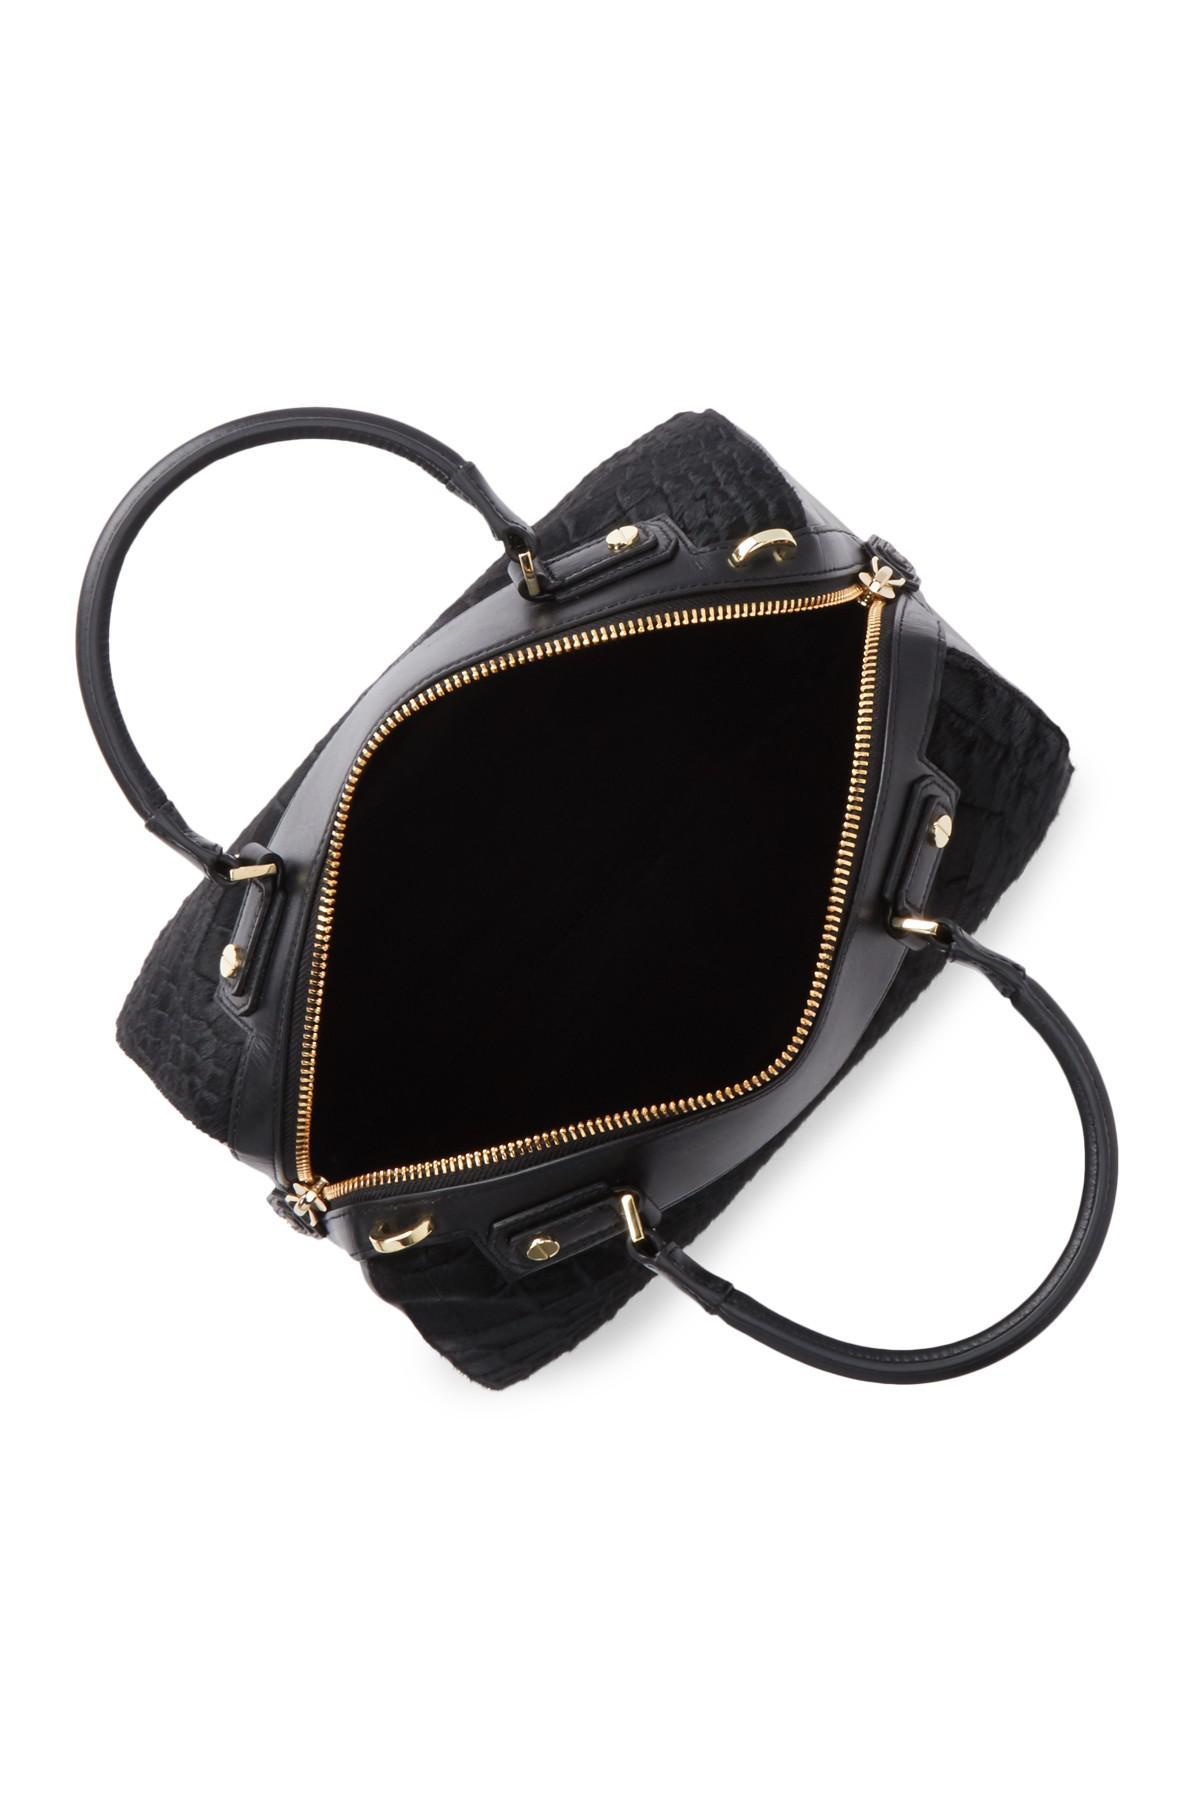 Alice + Olivia Leather Eloise Crocodile Embossed Genuine Dyed Calf Hair Bowler Bag in Black - Lyst